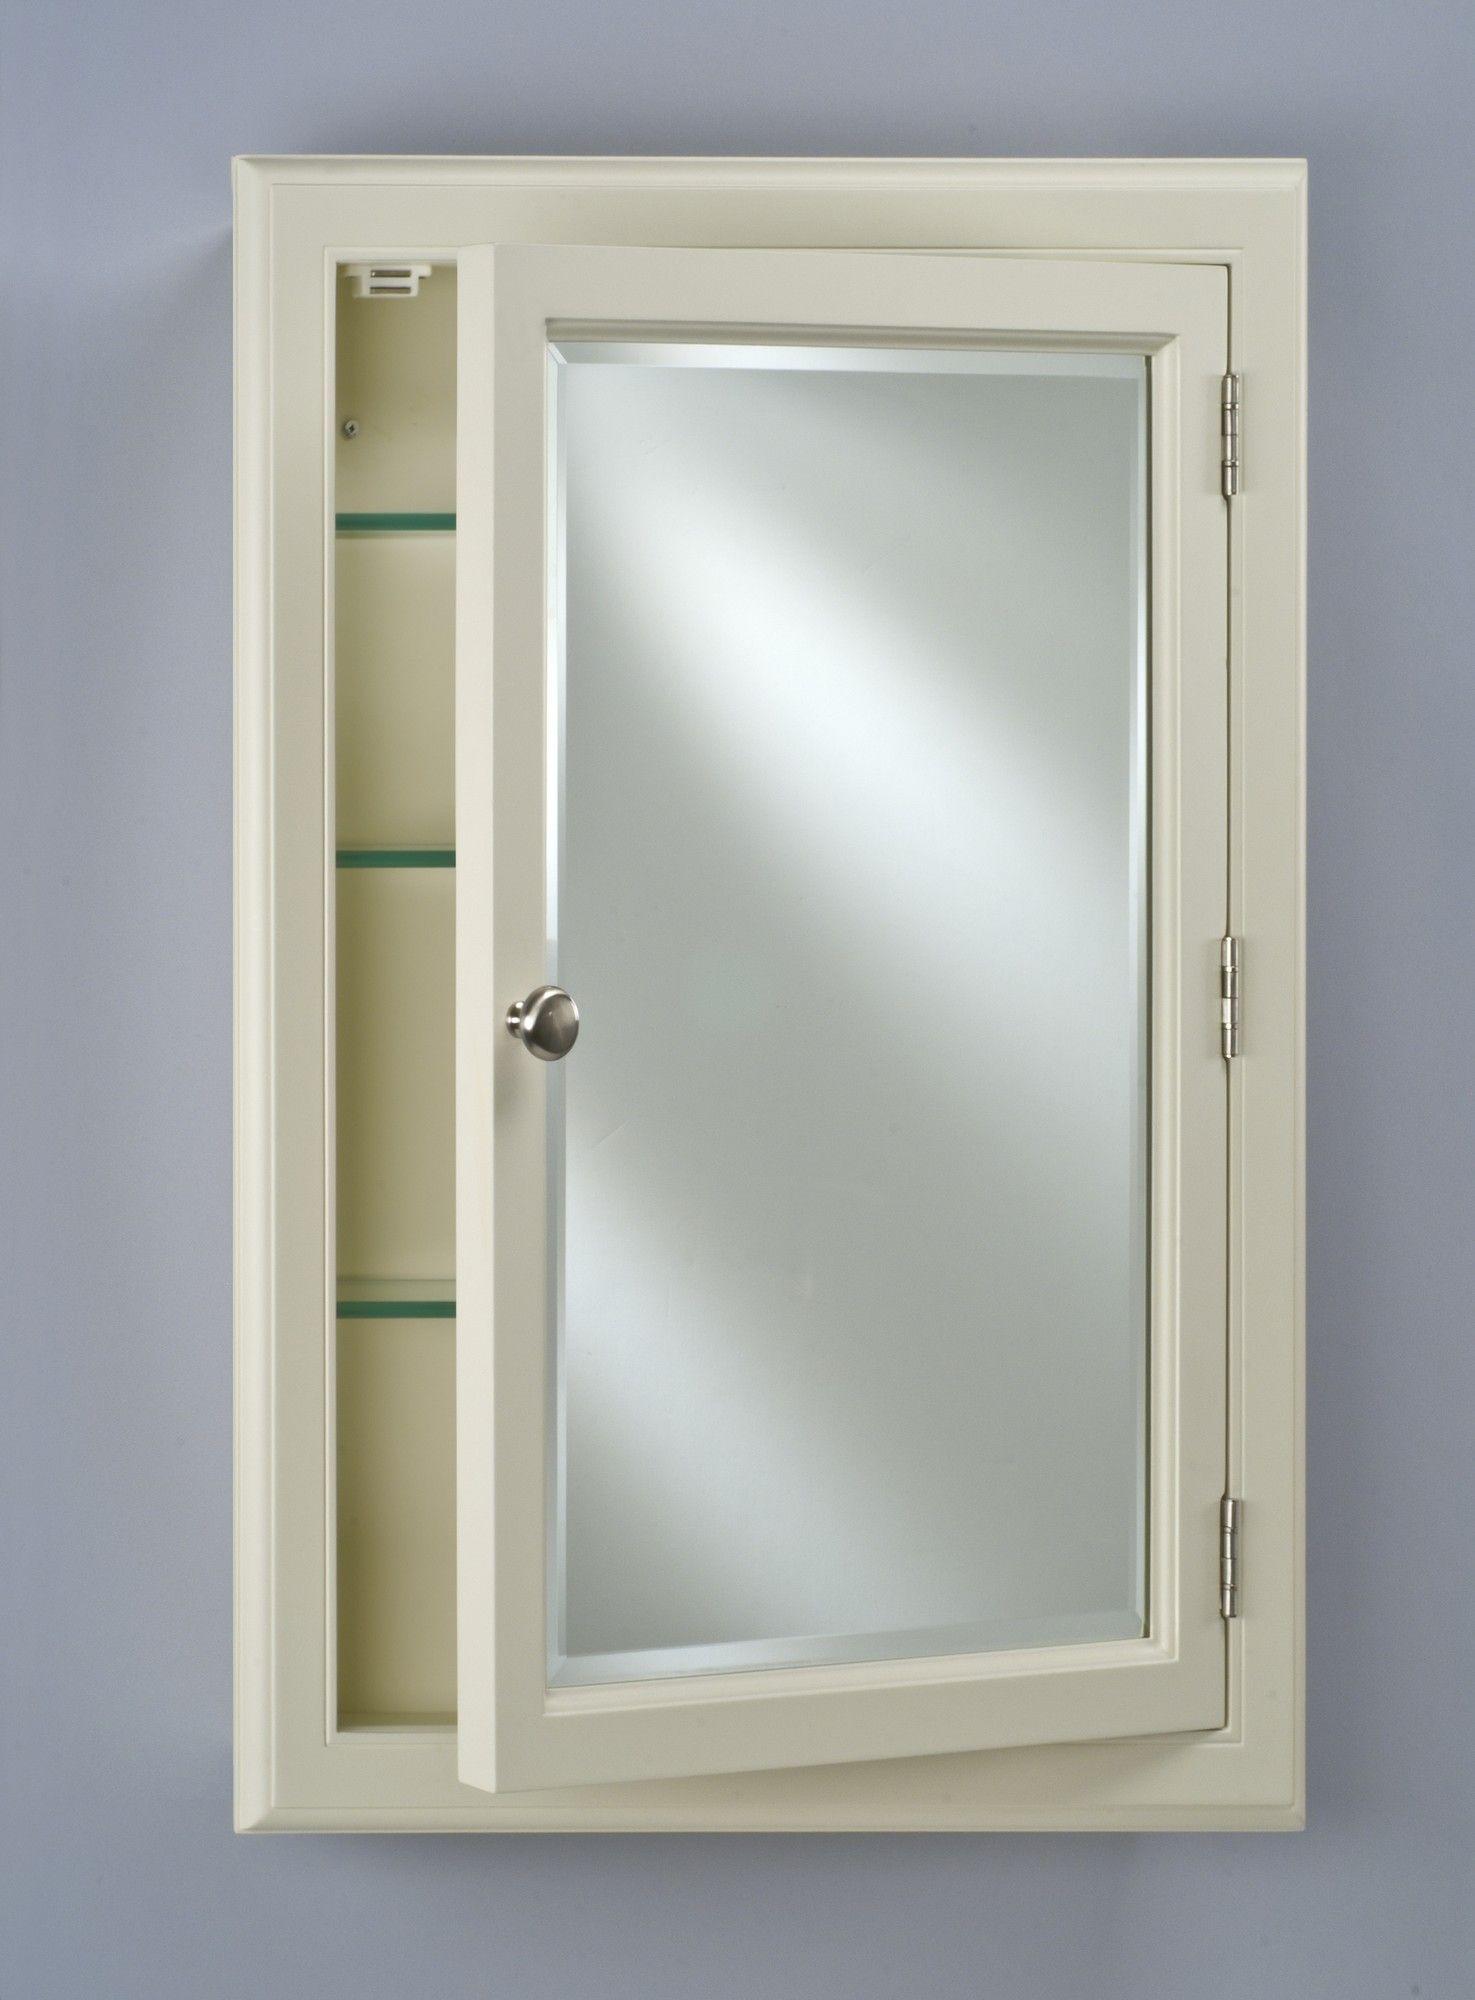 Parise Recessed Or Surface Mount Framed Medicine Cabinet With 4 Adjustable Shelves Recessed Medicine Cabinet Wood Medicine Cabinets Adjustable Shelving